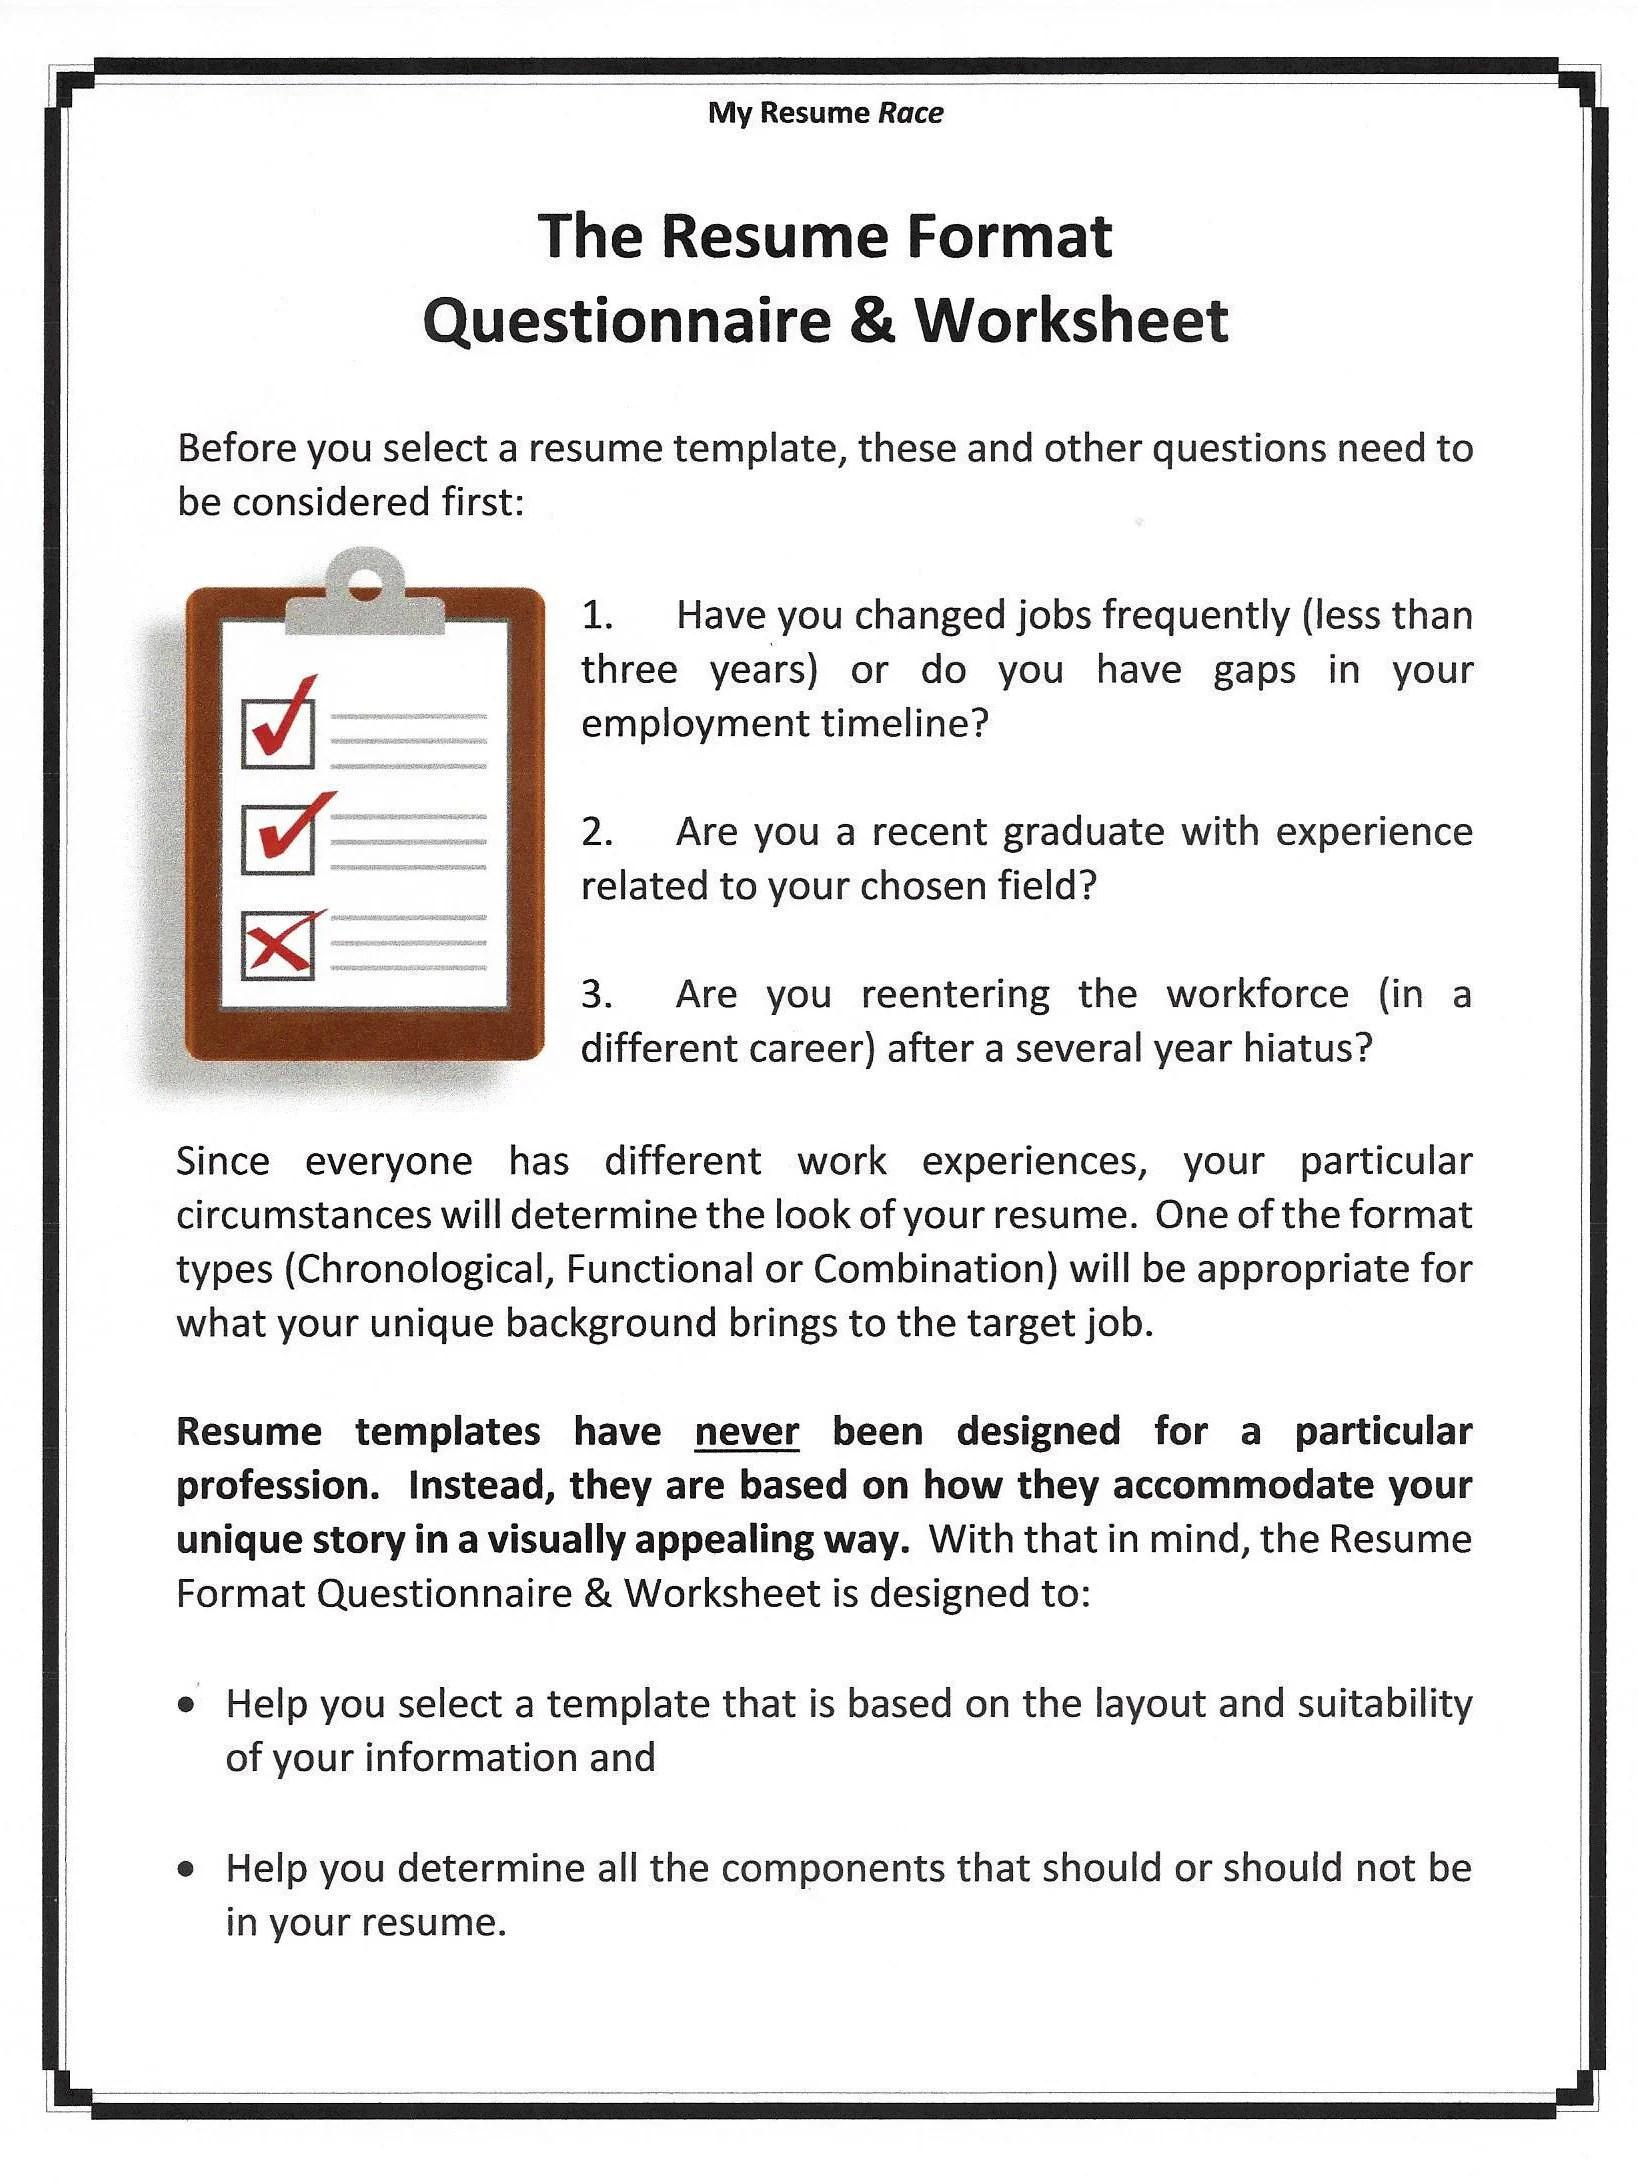 Resume Format Questionnaire Amp Worksheet